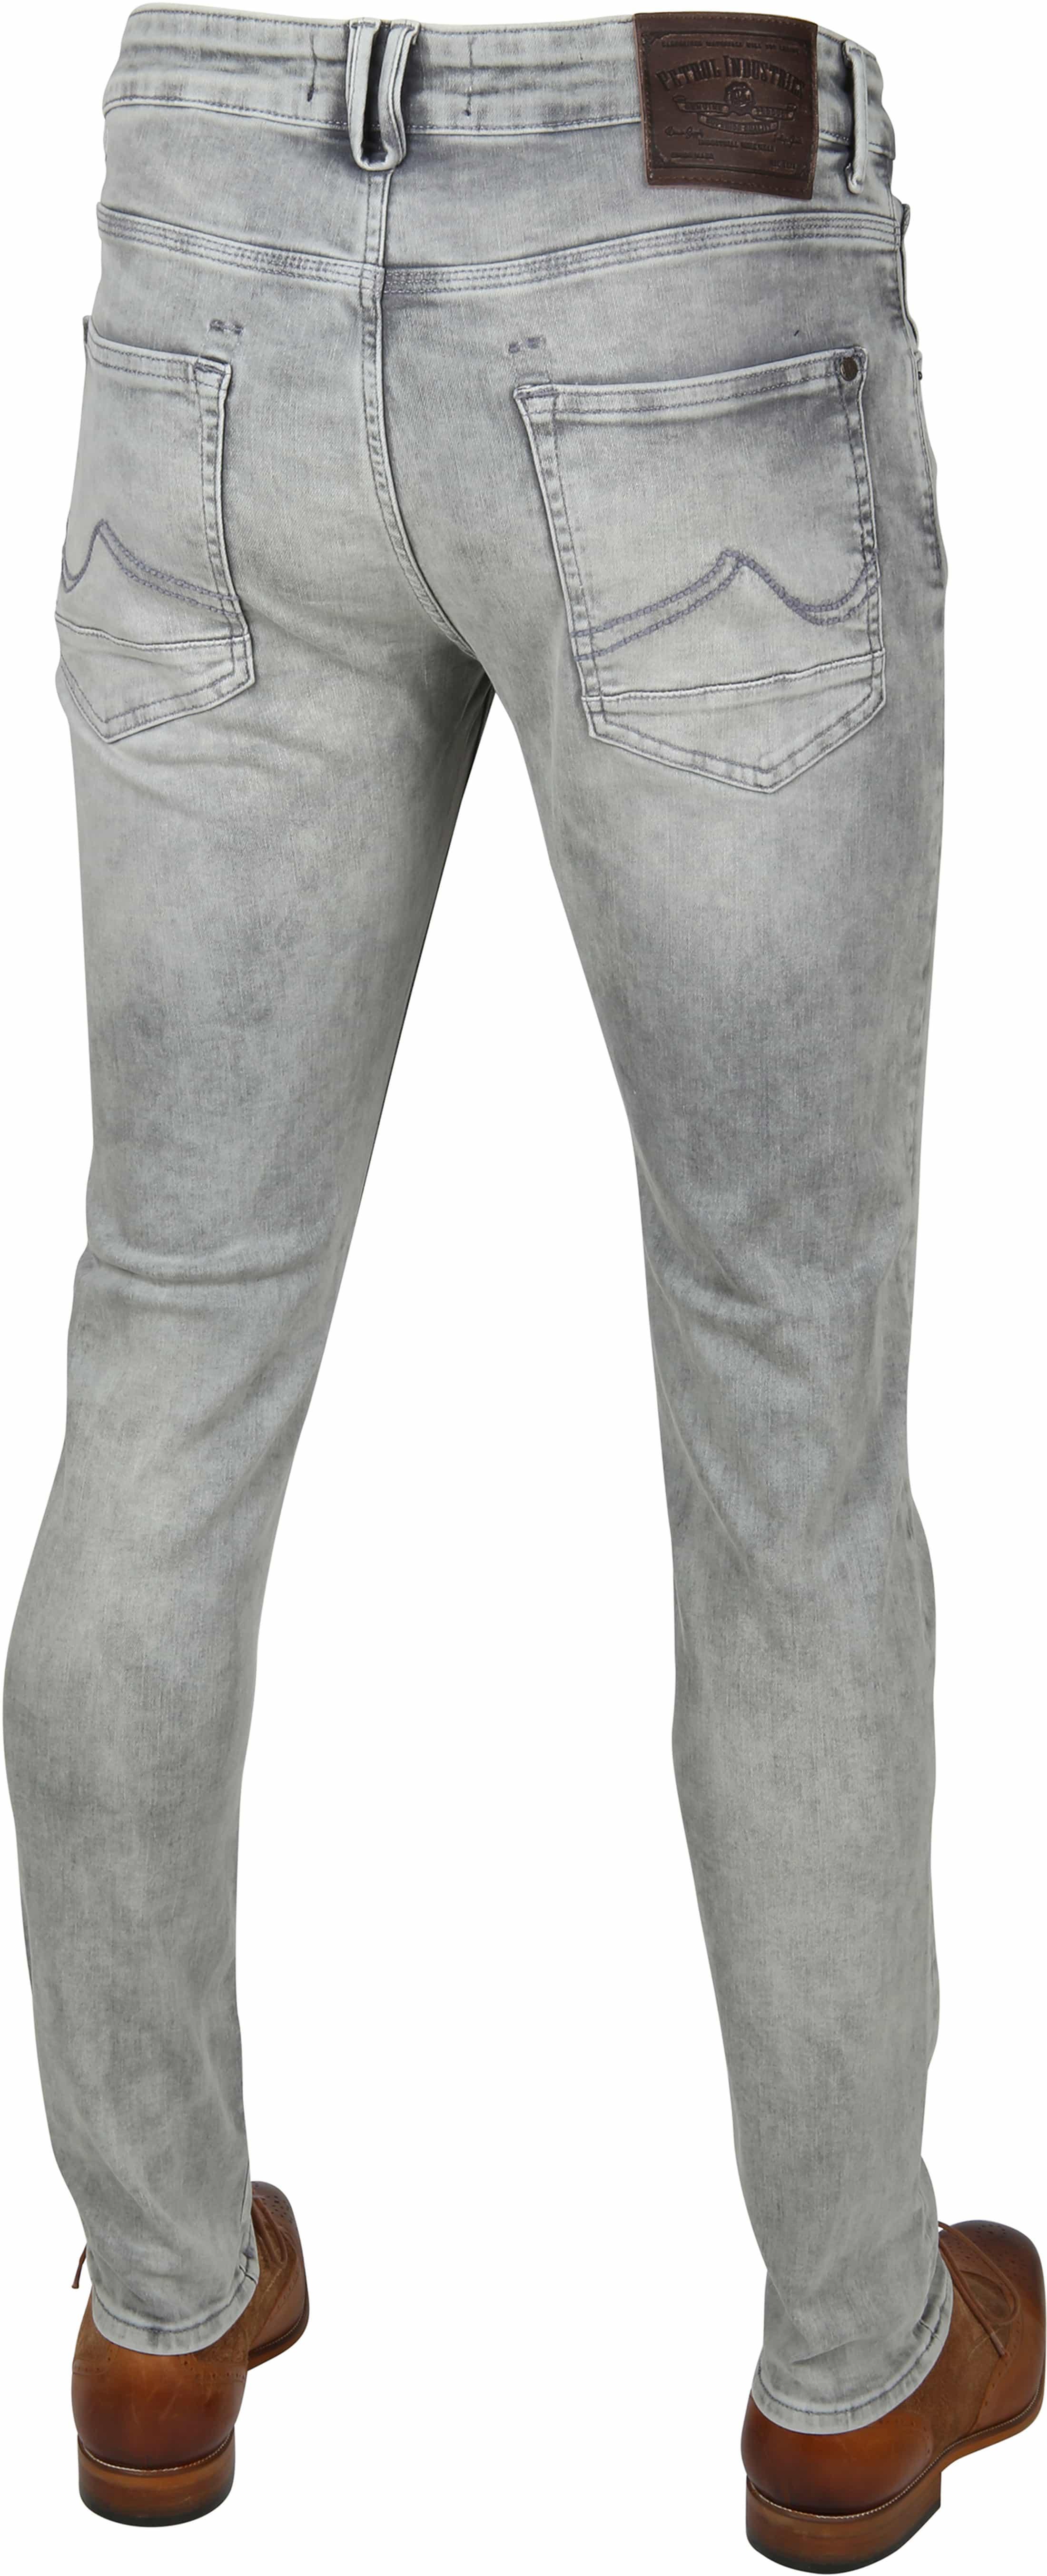 Petrol Seaham Jeans Grau Foto 3